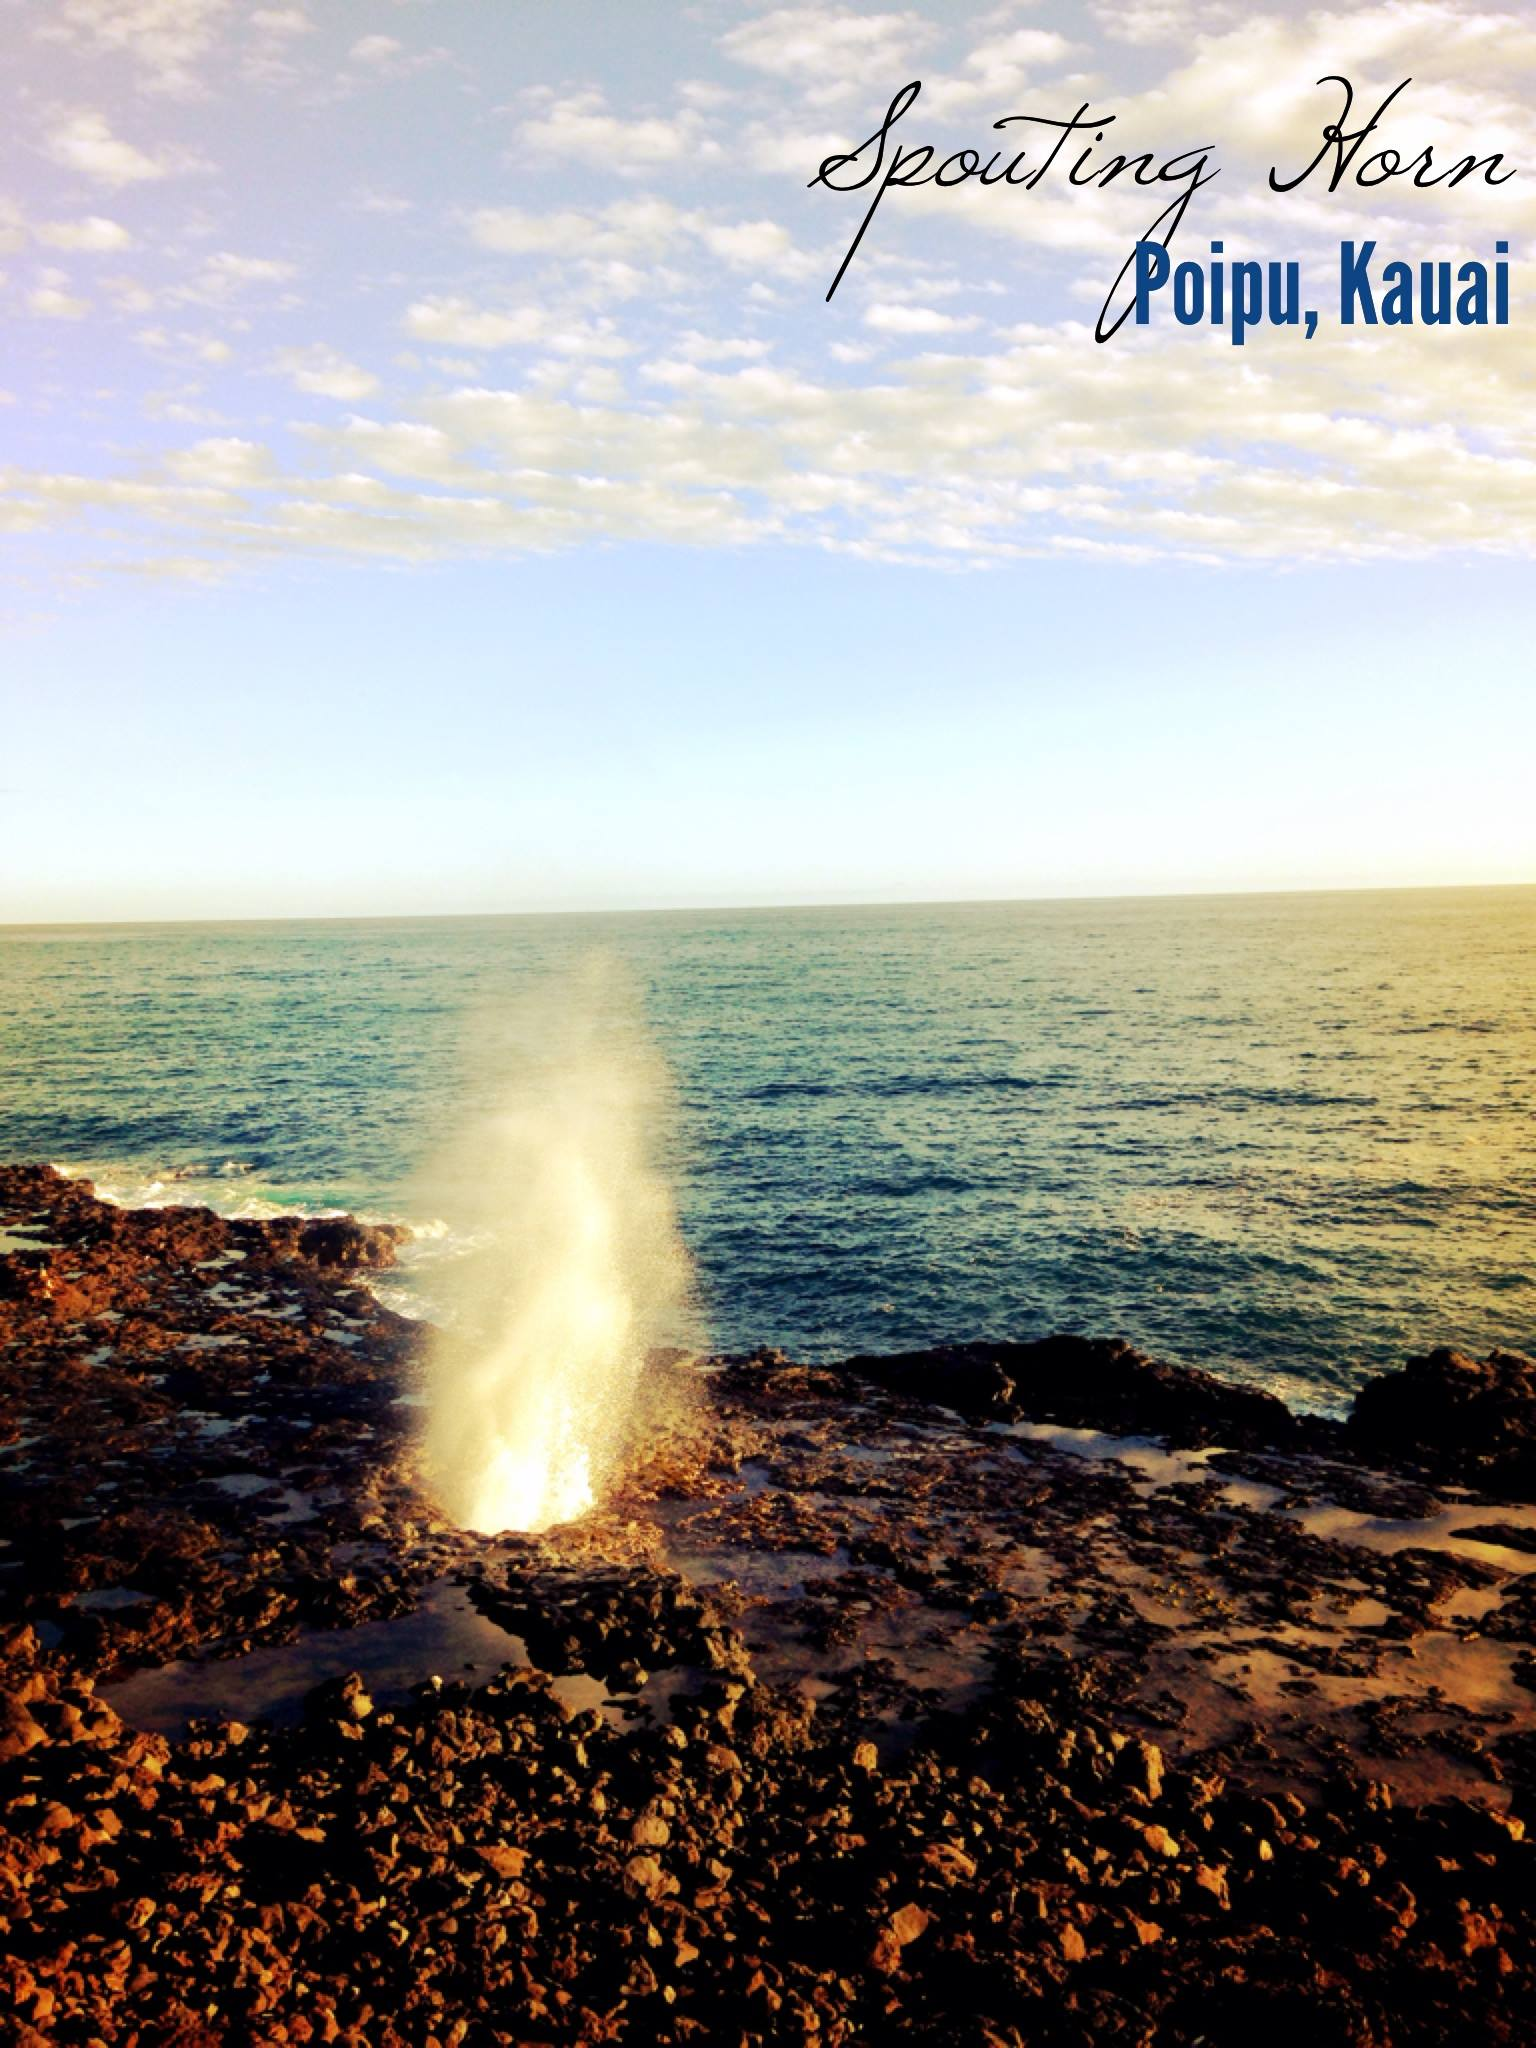 Spouting Horn, Poipu, Kauai, Hawaii